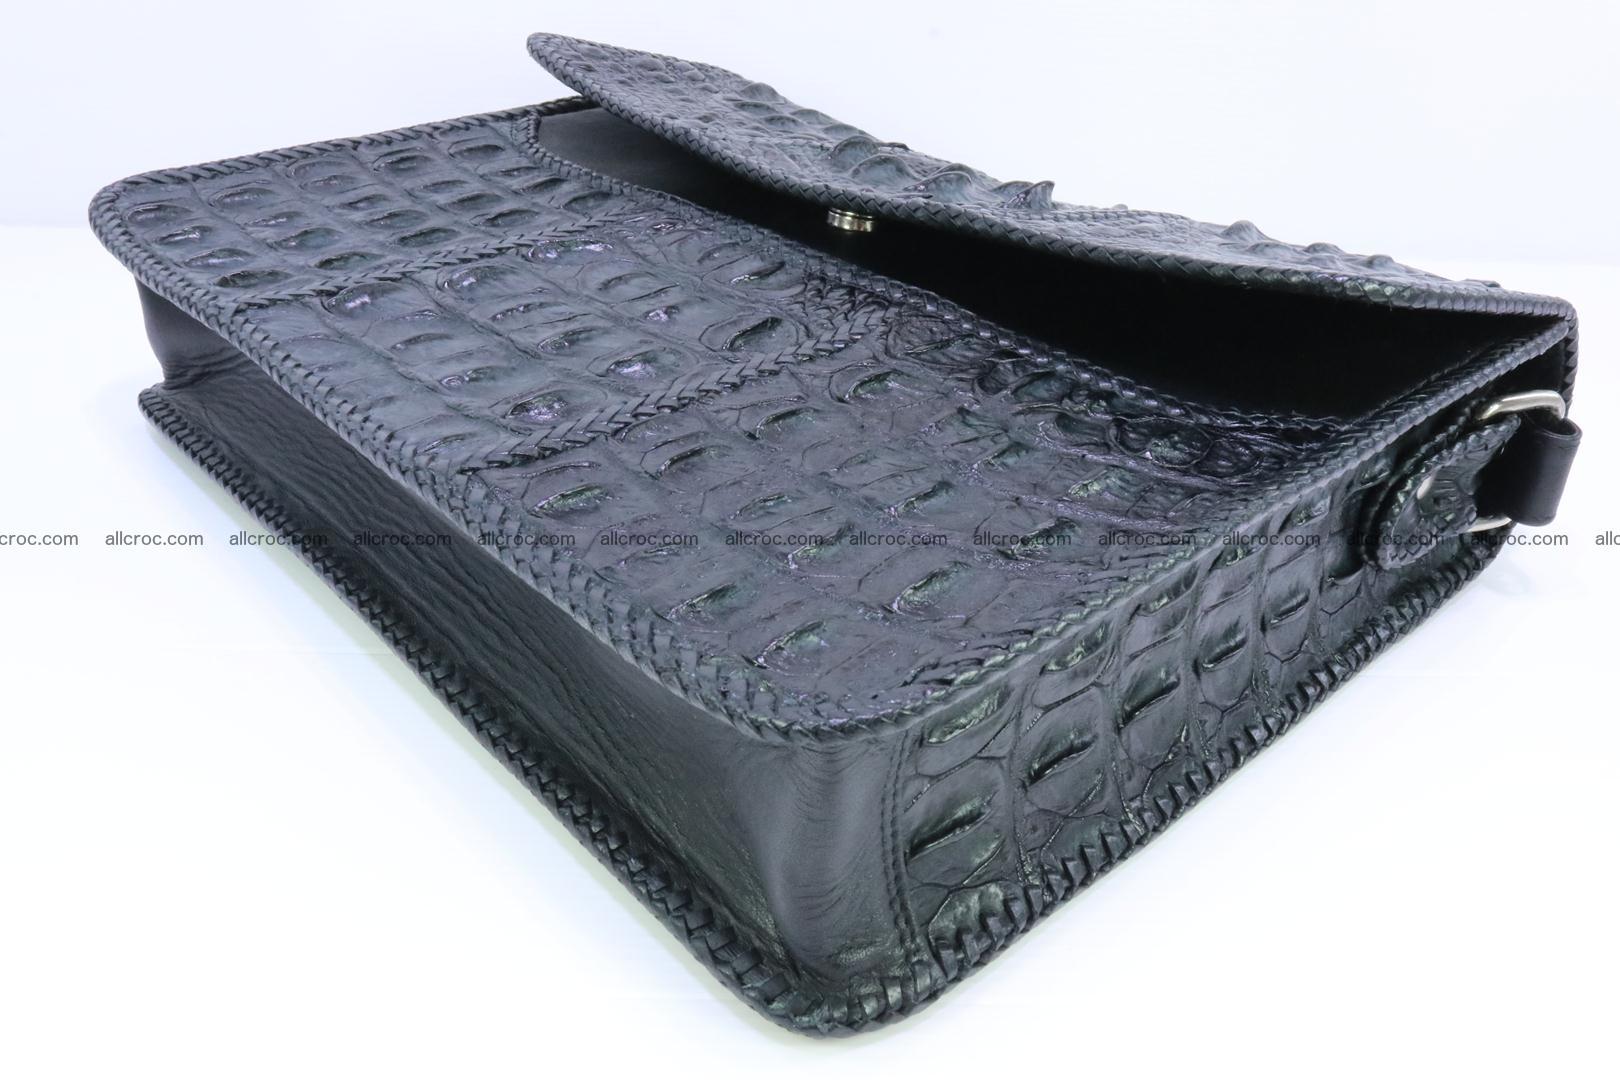 Crocodile skin shoulder bag with braided edges 147 Foto 8